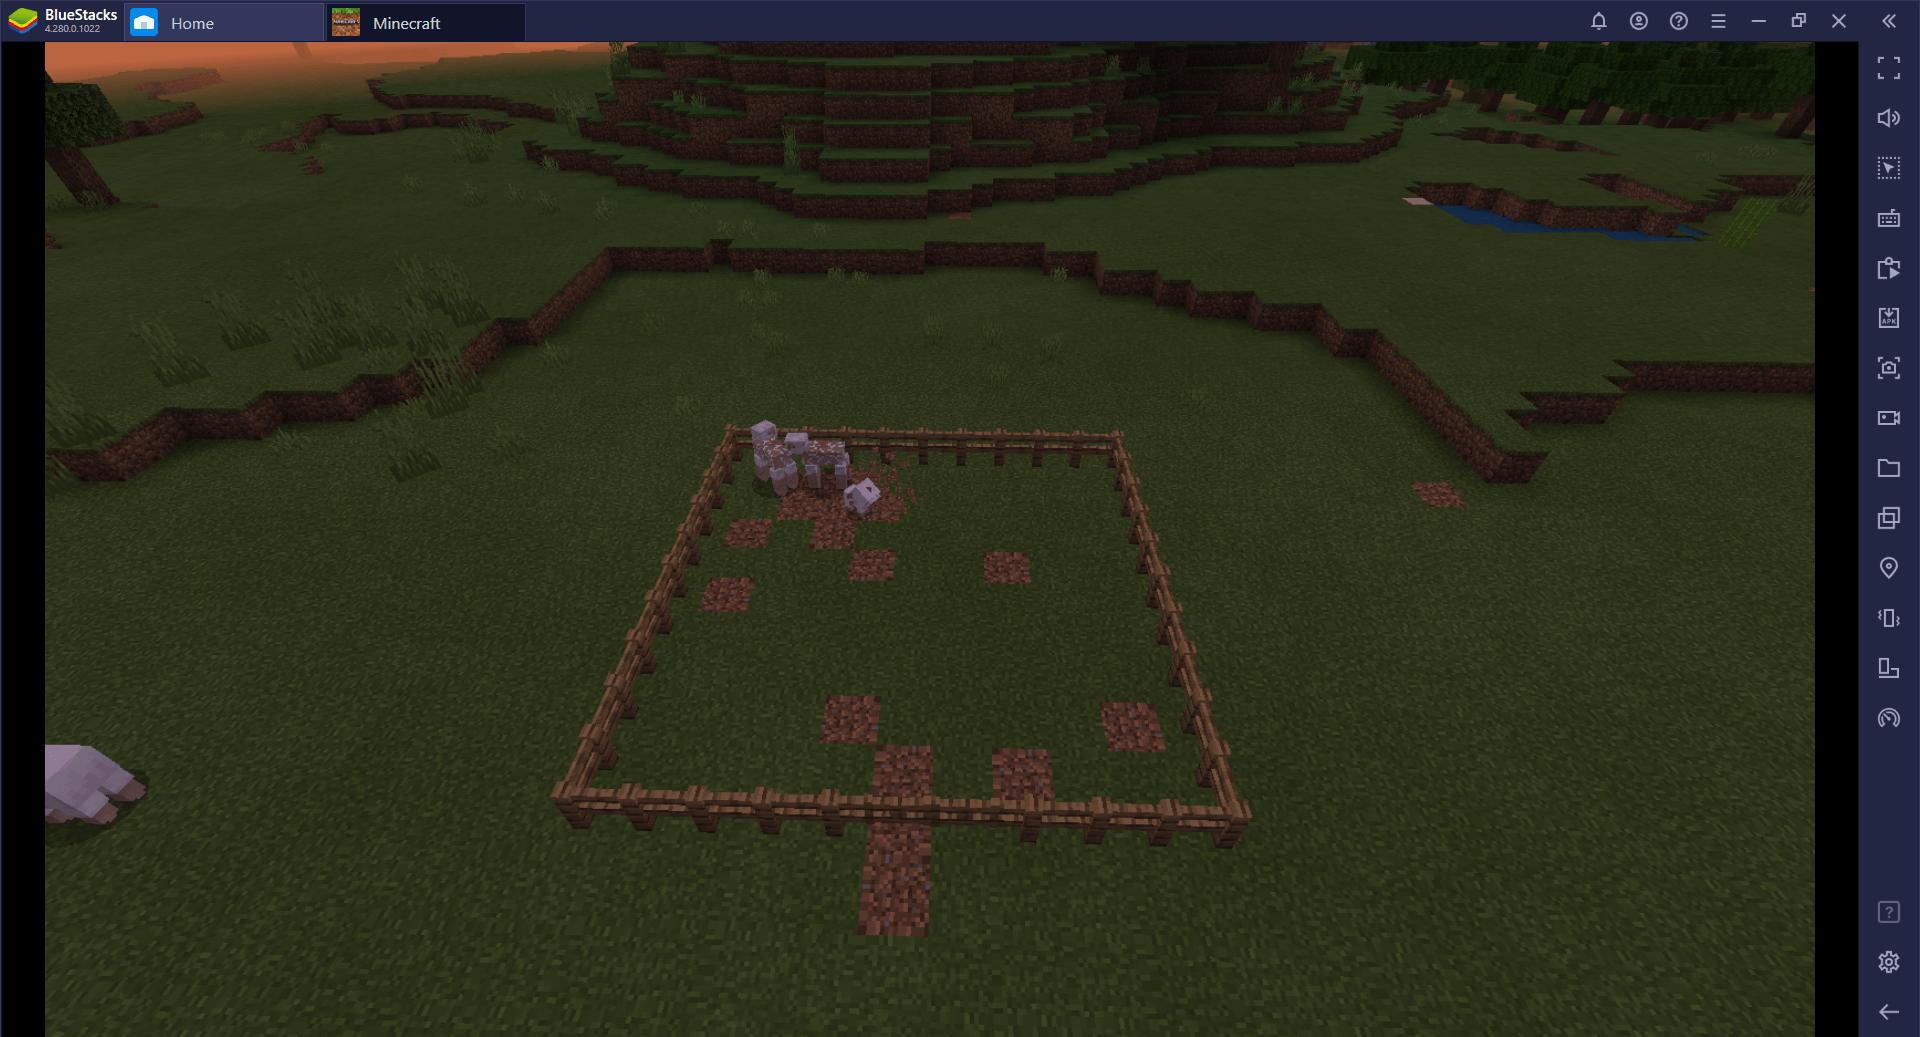 BlueStacks ile Minecraft Çiftlik Kurma Rehberi